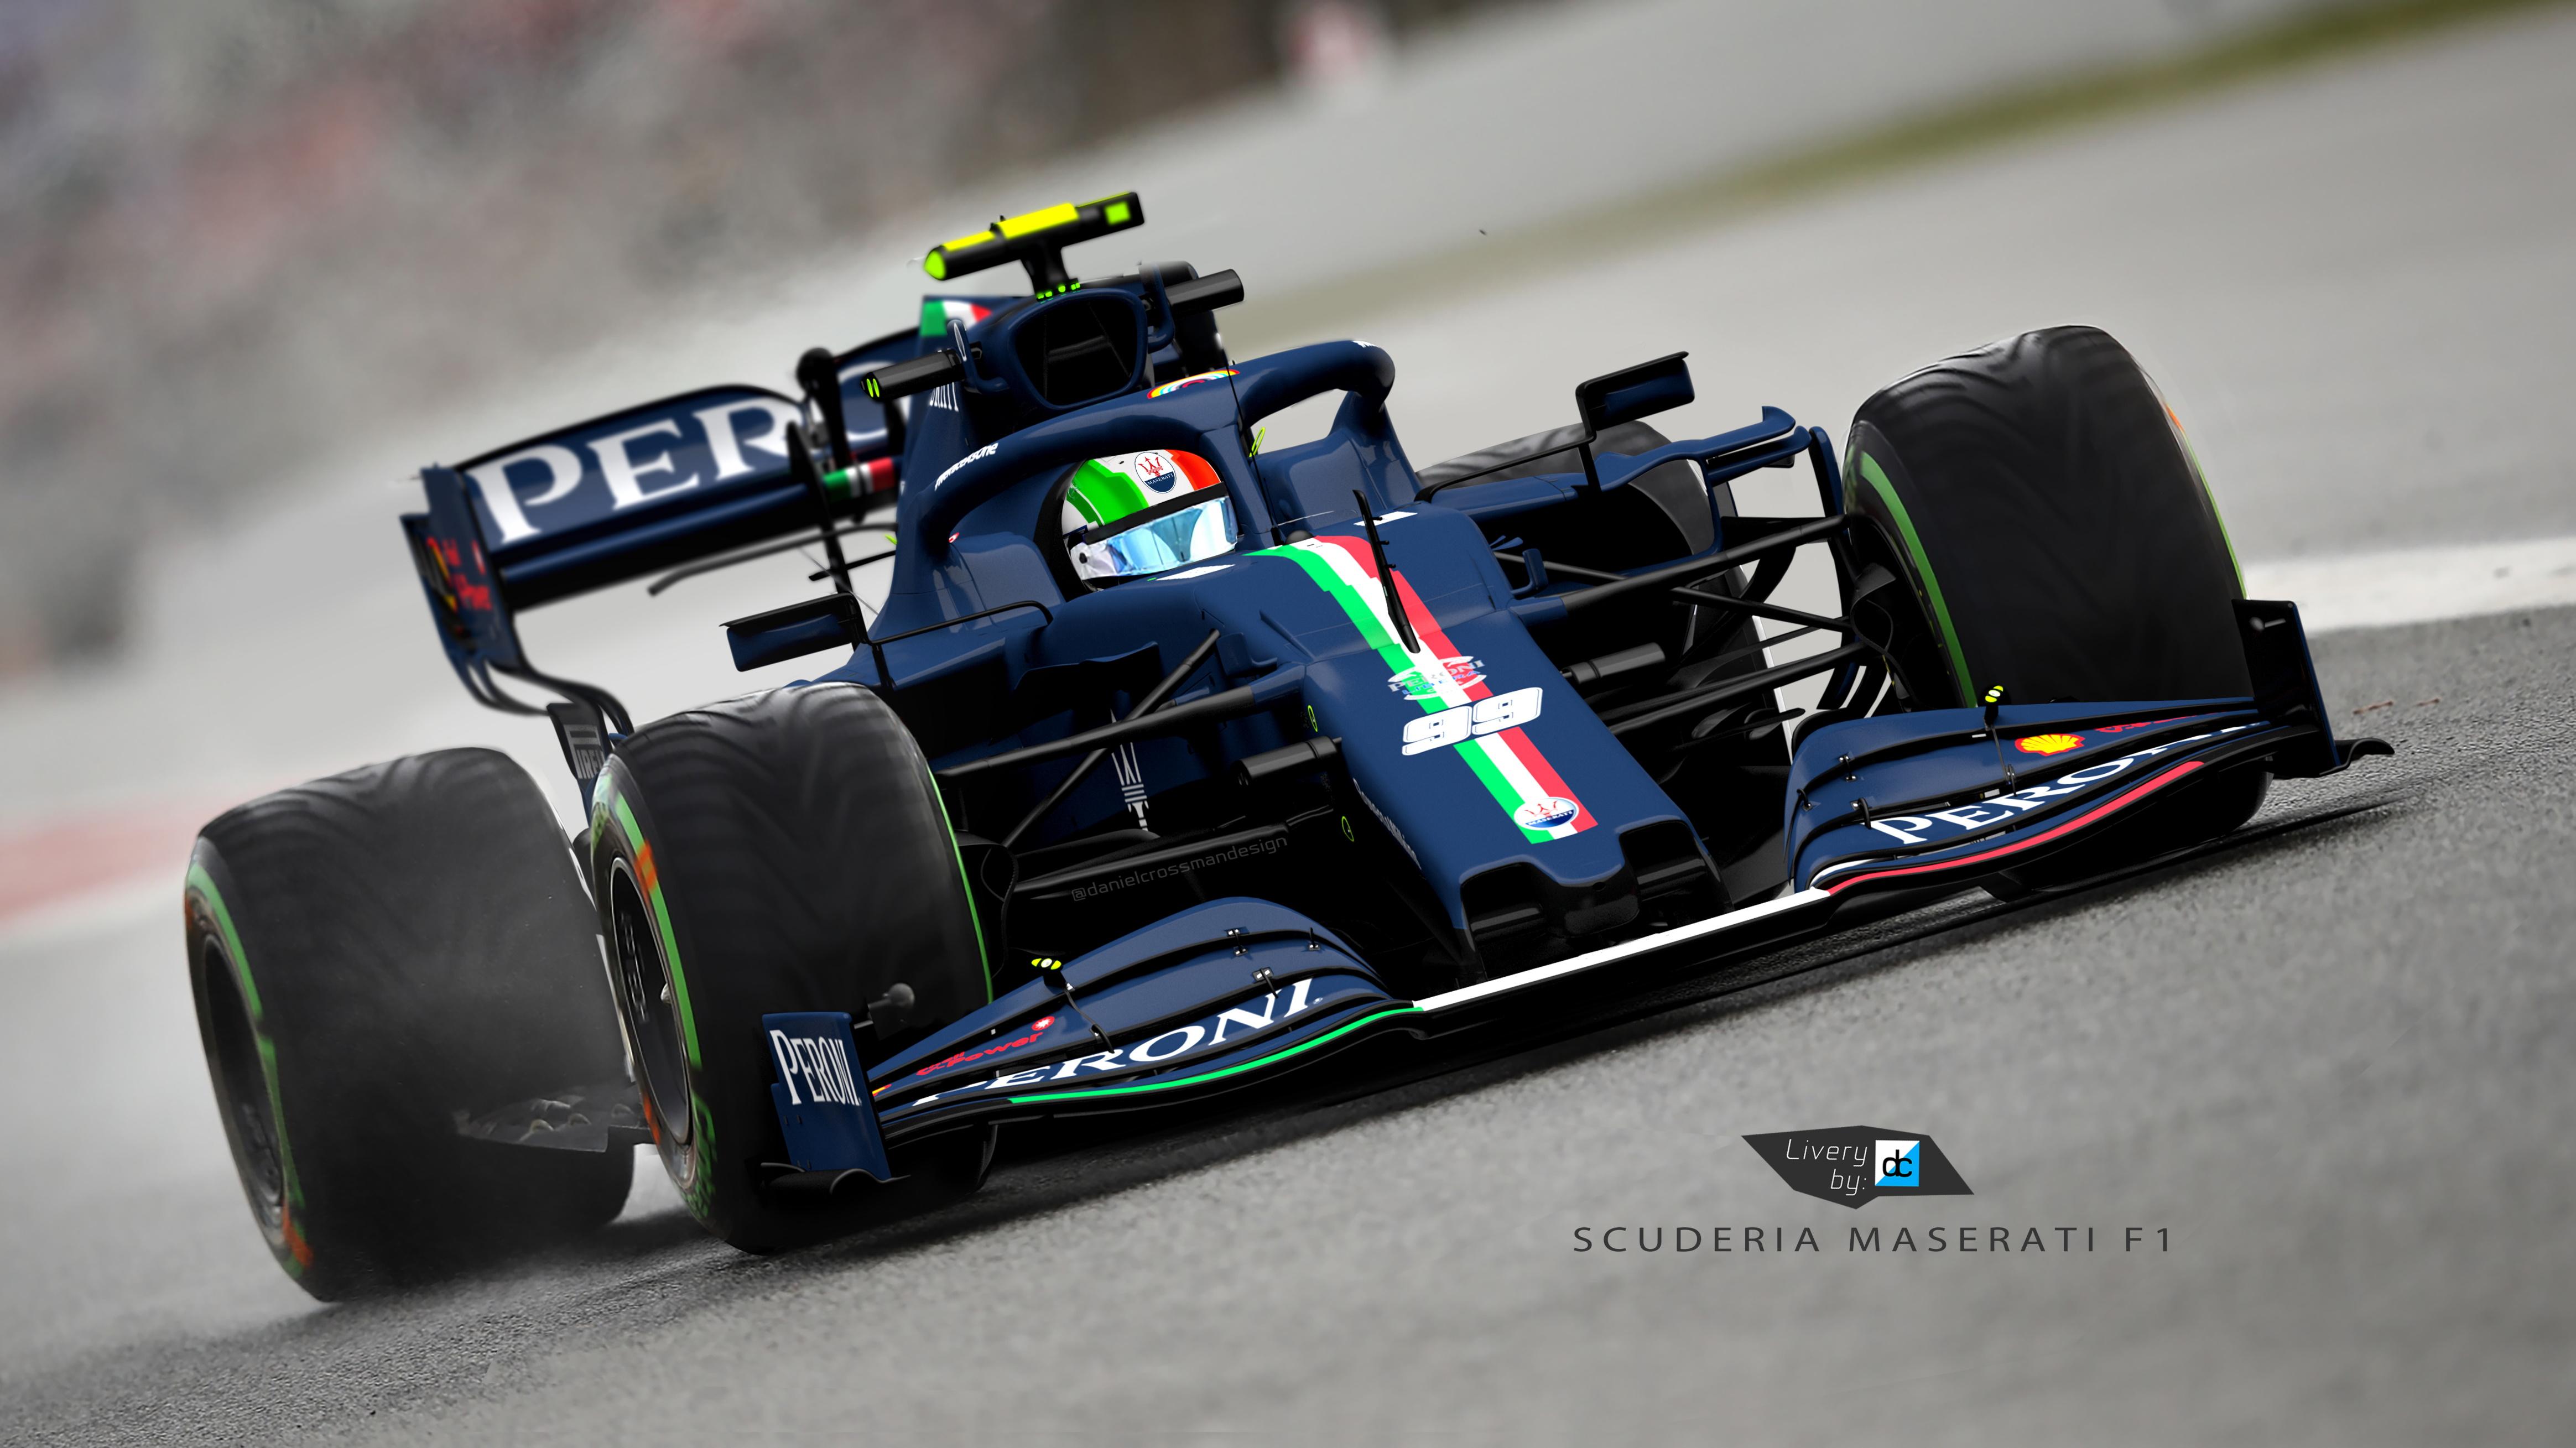 F1_2020_On_Track_Frontangle_maserati_RD.jpg